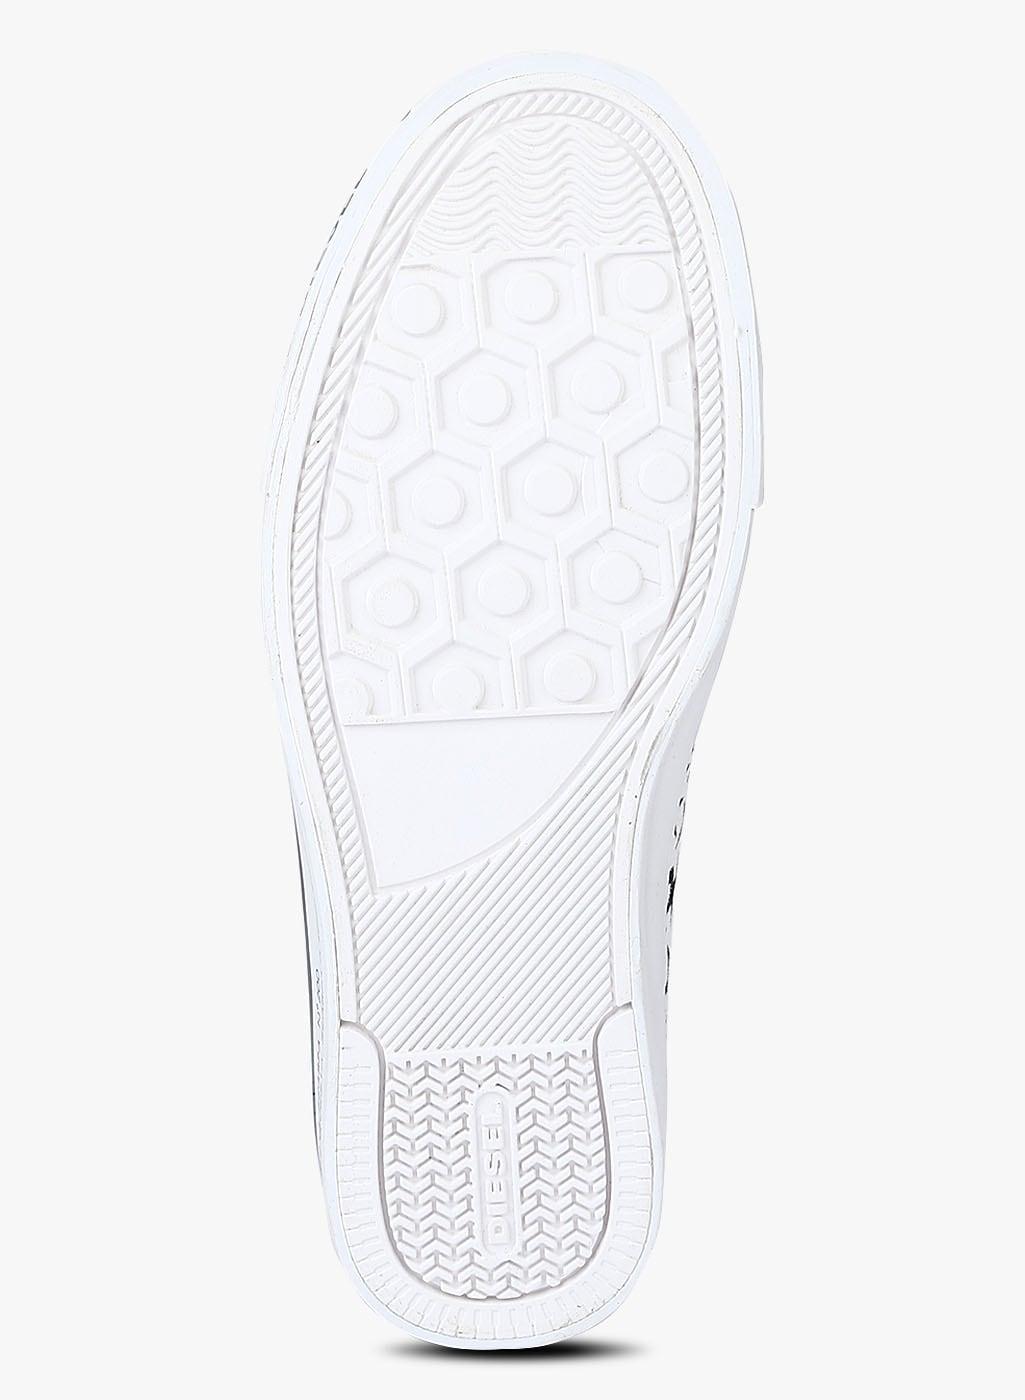 Imaginee S-Imaginee White Casual Sneakers